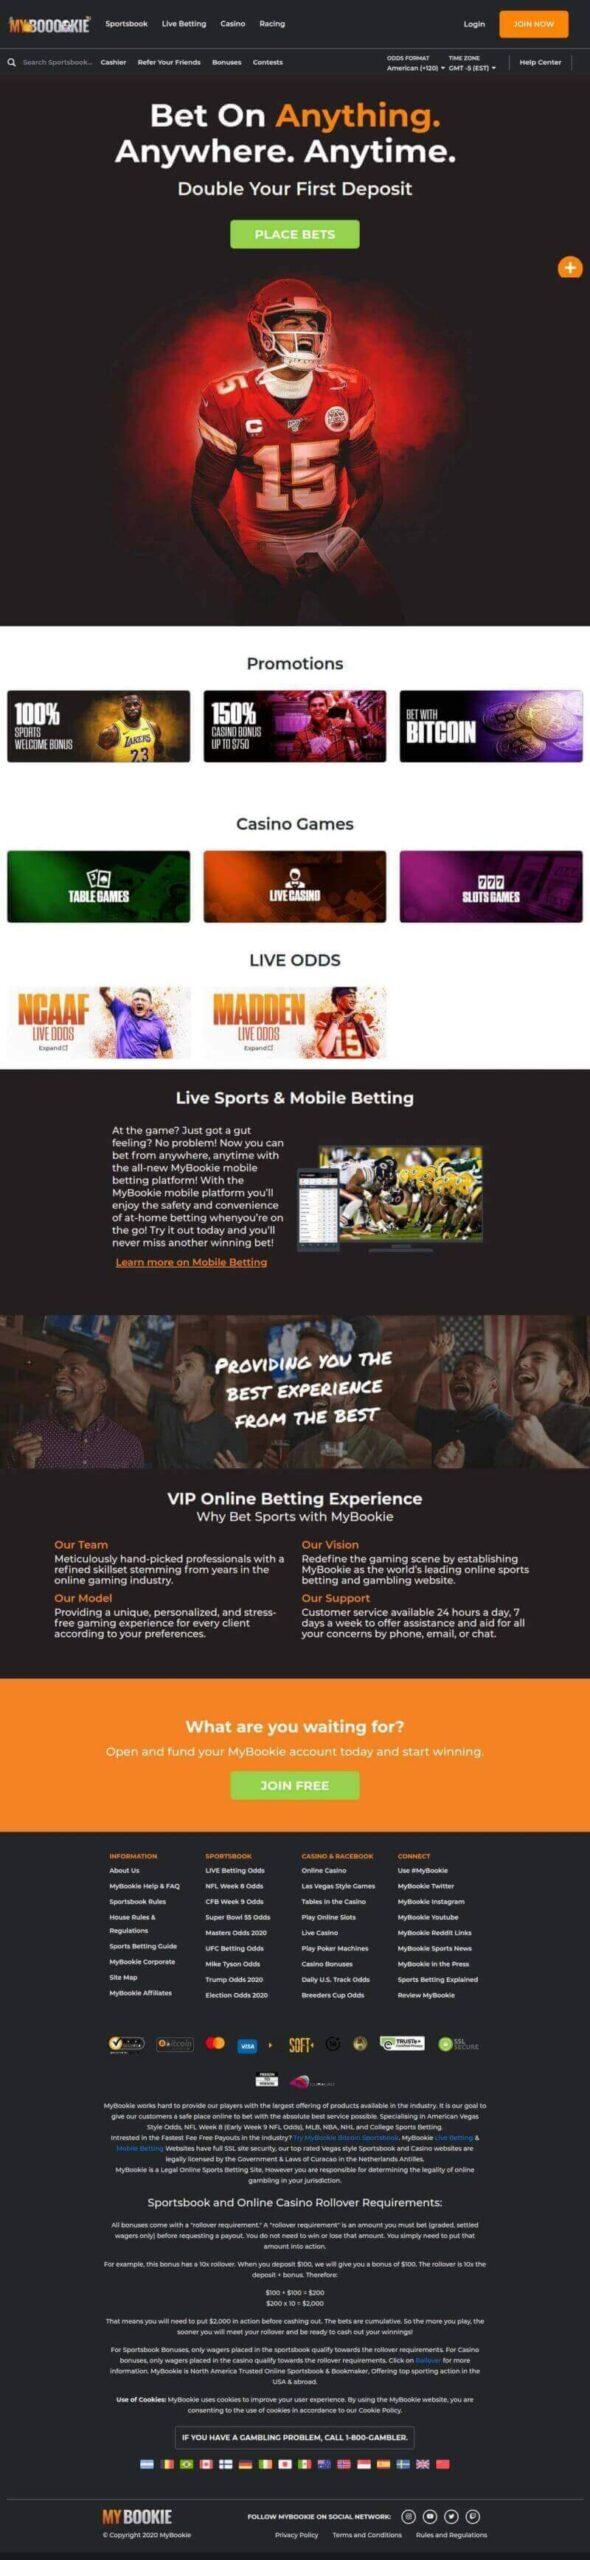 Bet USA Sports, Bitcoin Sportsbook Sign Up Bonus - Vegas Week 8 NFL - mybookie.ag